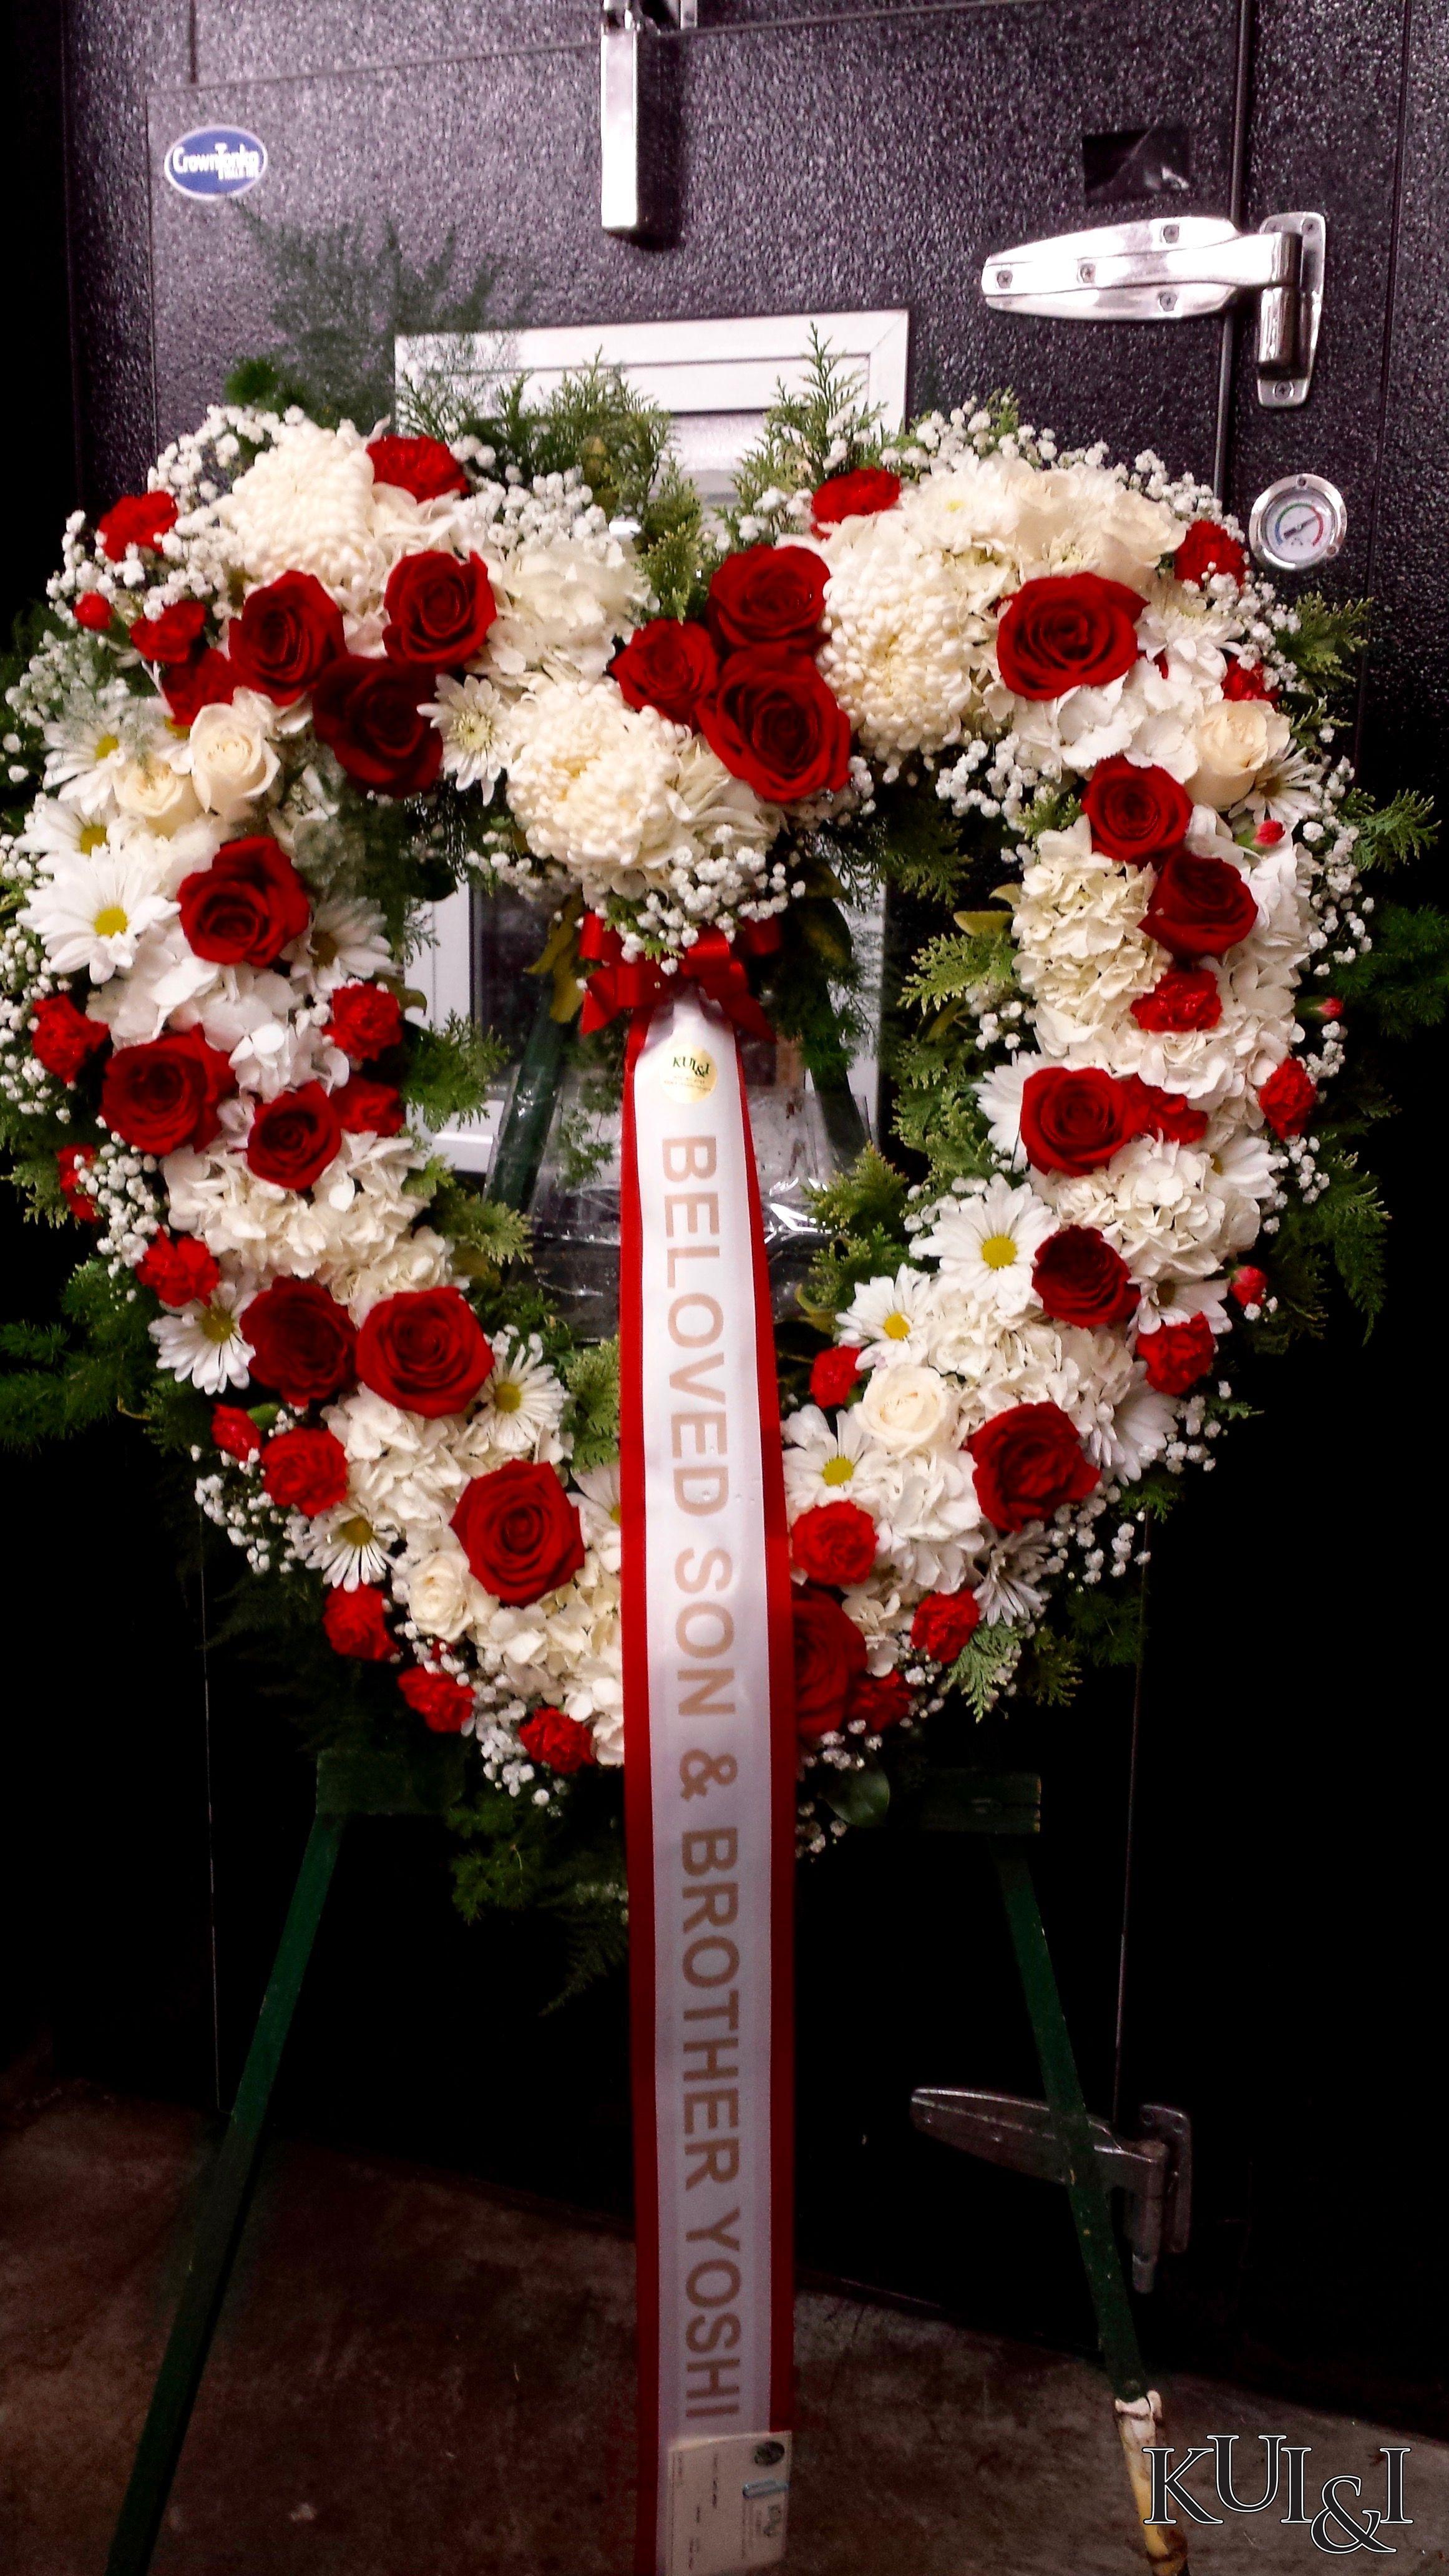 White and red heart funeral wreath kuiandiflorist kuiandi white and red heart funeral wreath kuiandiflorist kuiandi funeral arrangements flower arrangements izmirmasajfo